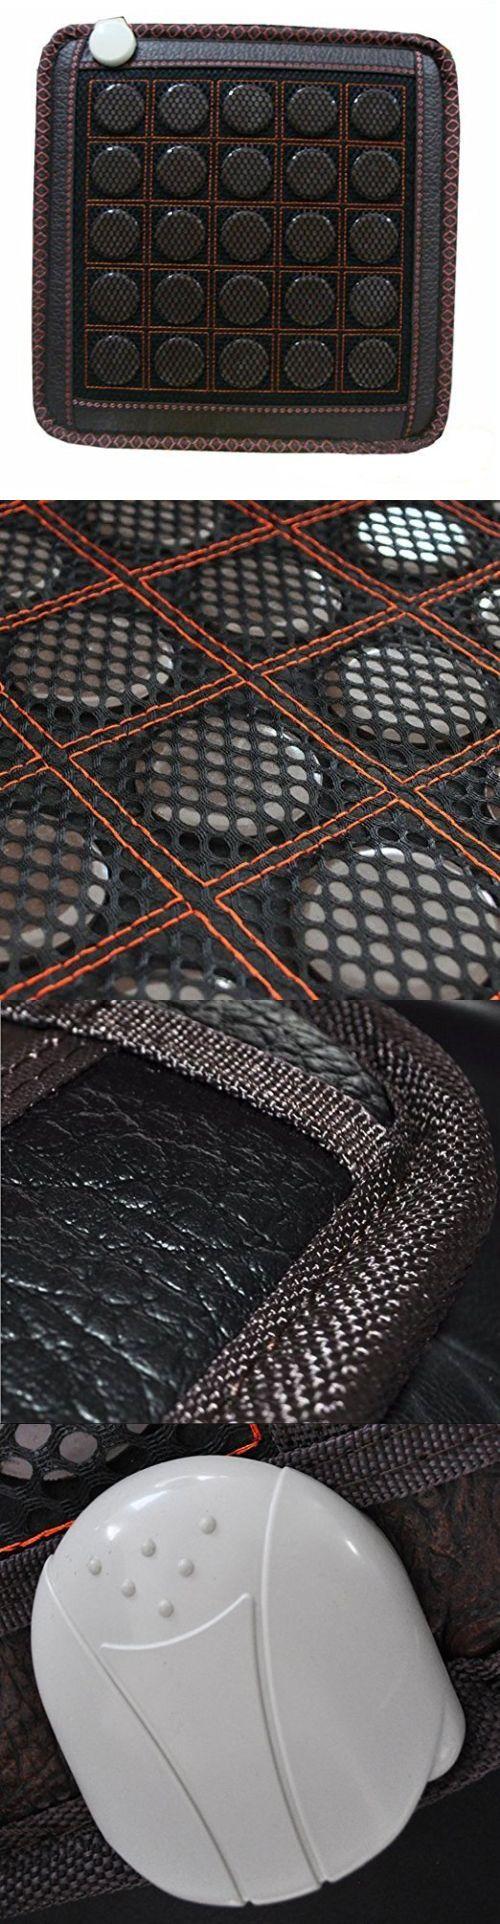 Electric Heating Pads: Far-Infrared Heat Therapy Healing Jade Mat Pad  Mattress Cool Mat